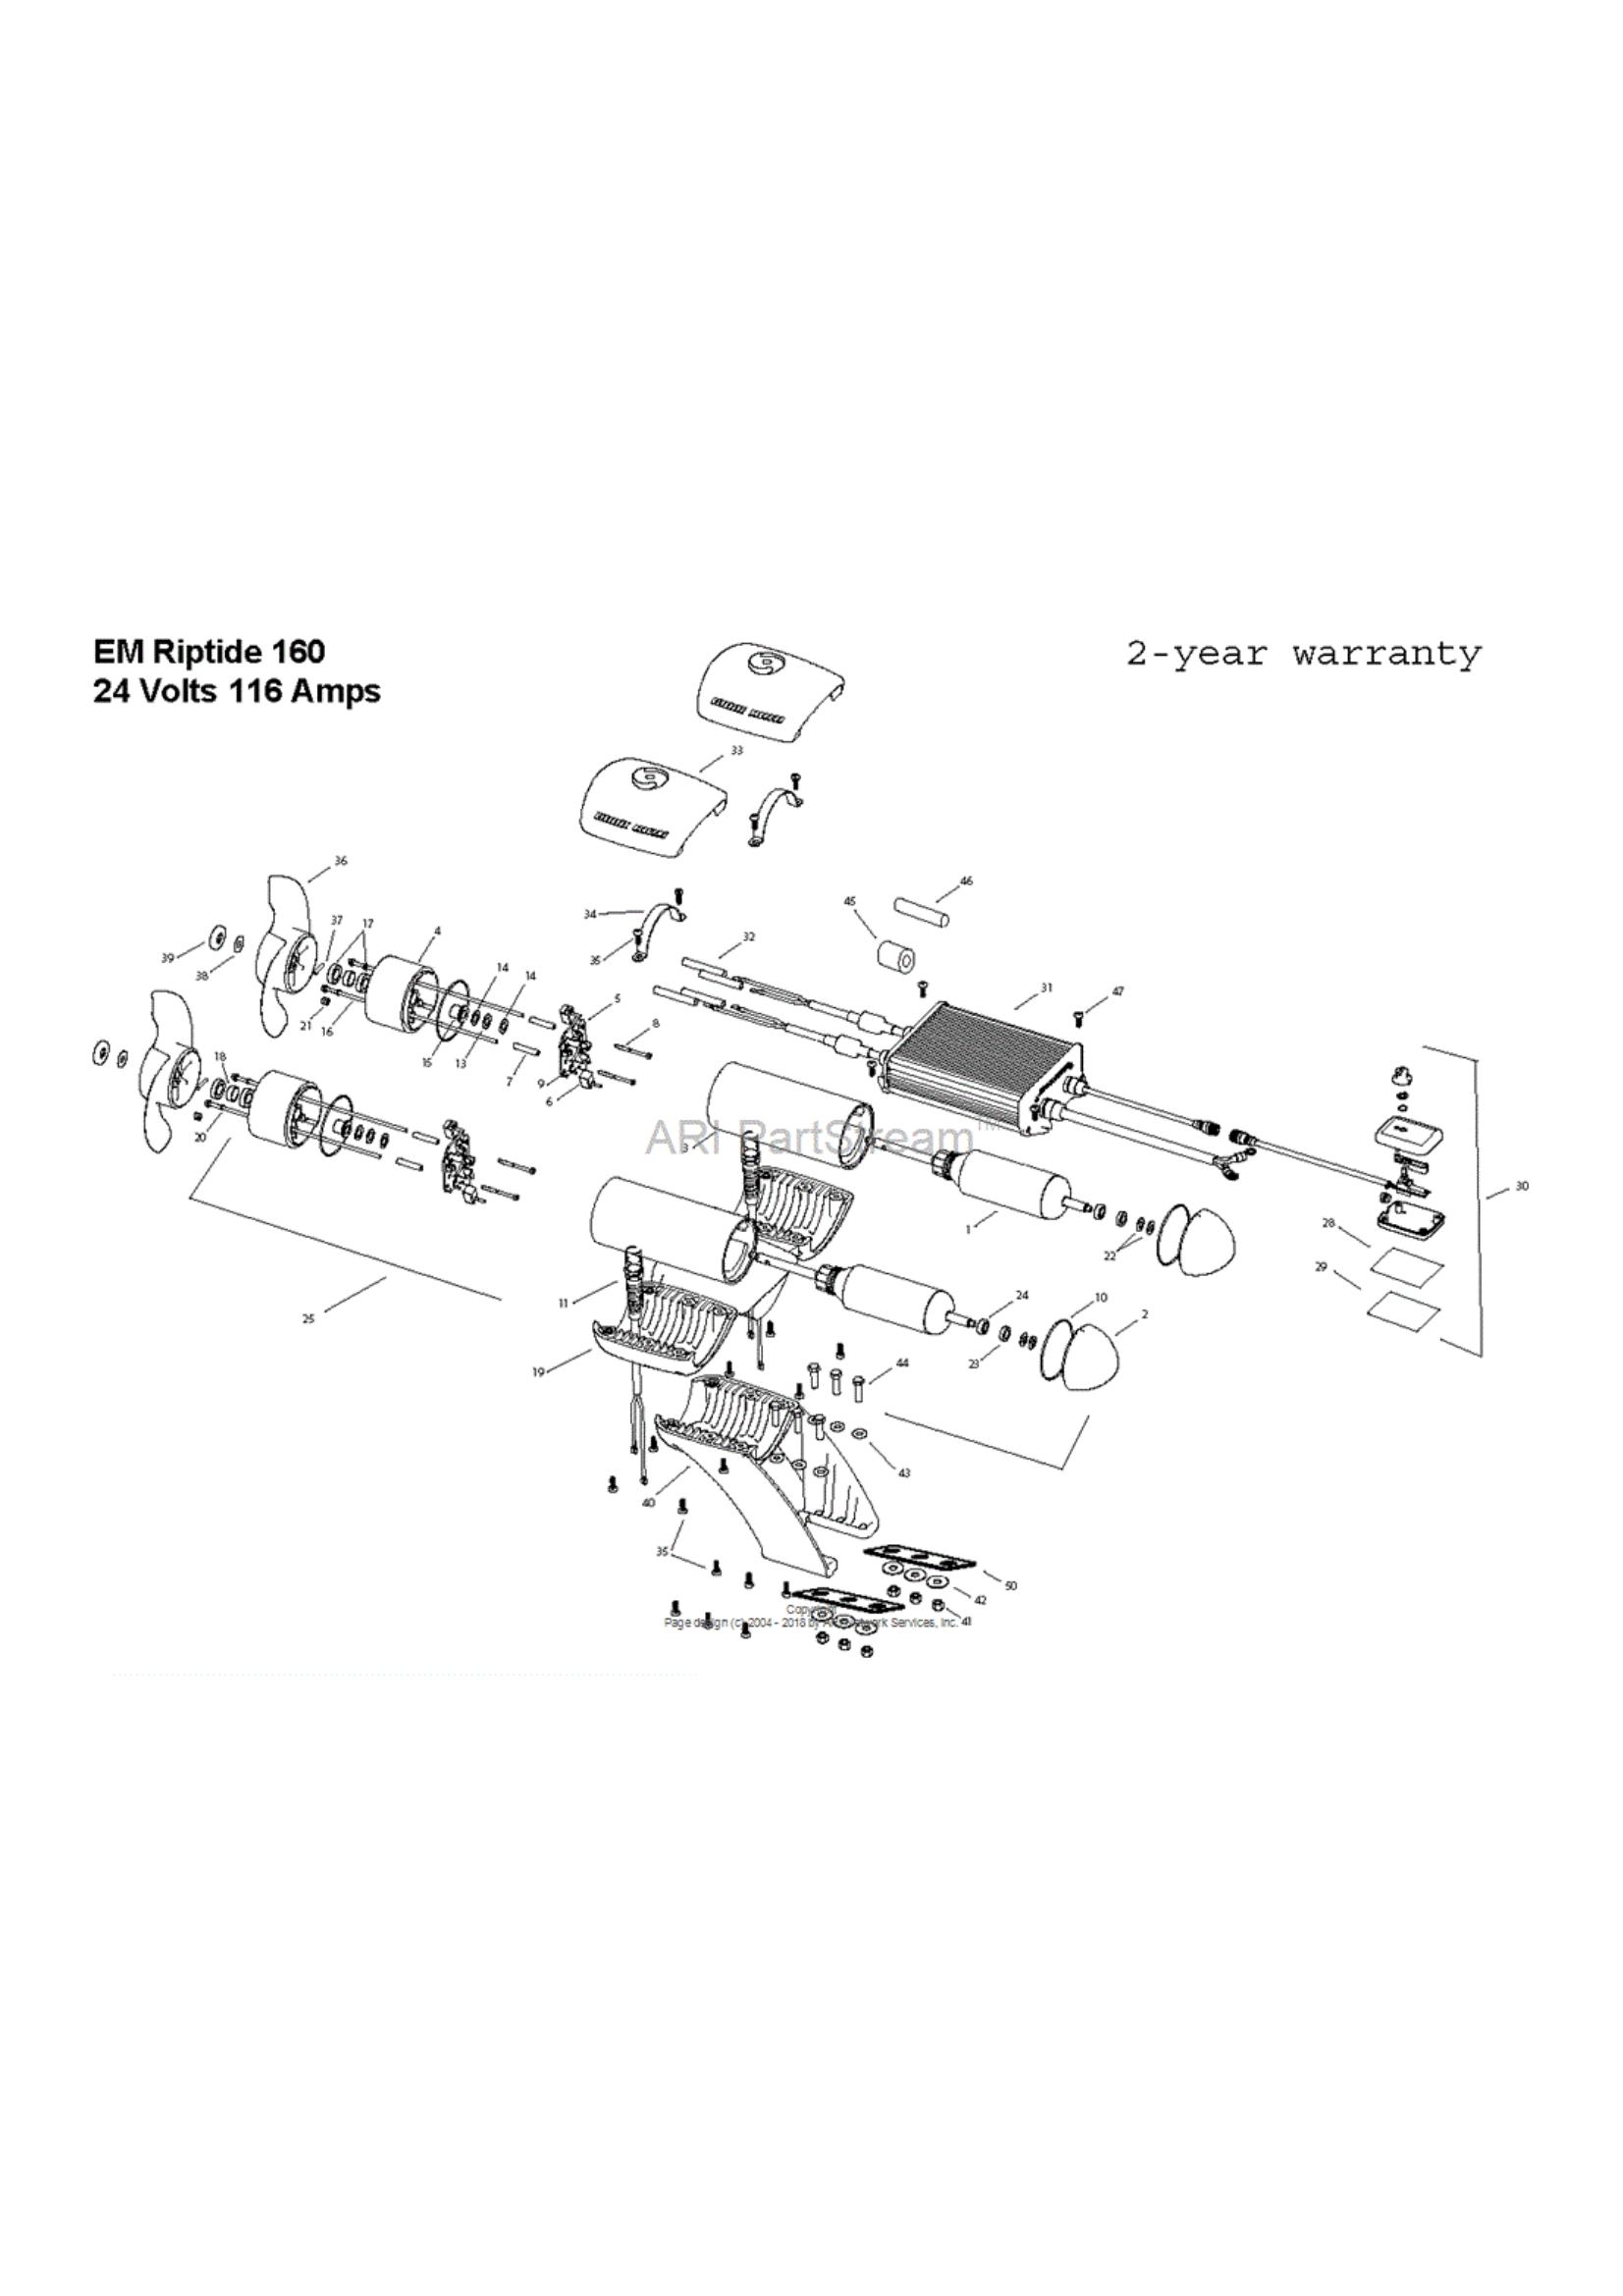 Minn Kota Engine Mount Riptide 160 Parts - 2015 from FISH307 com